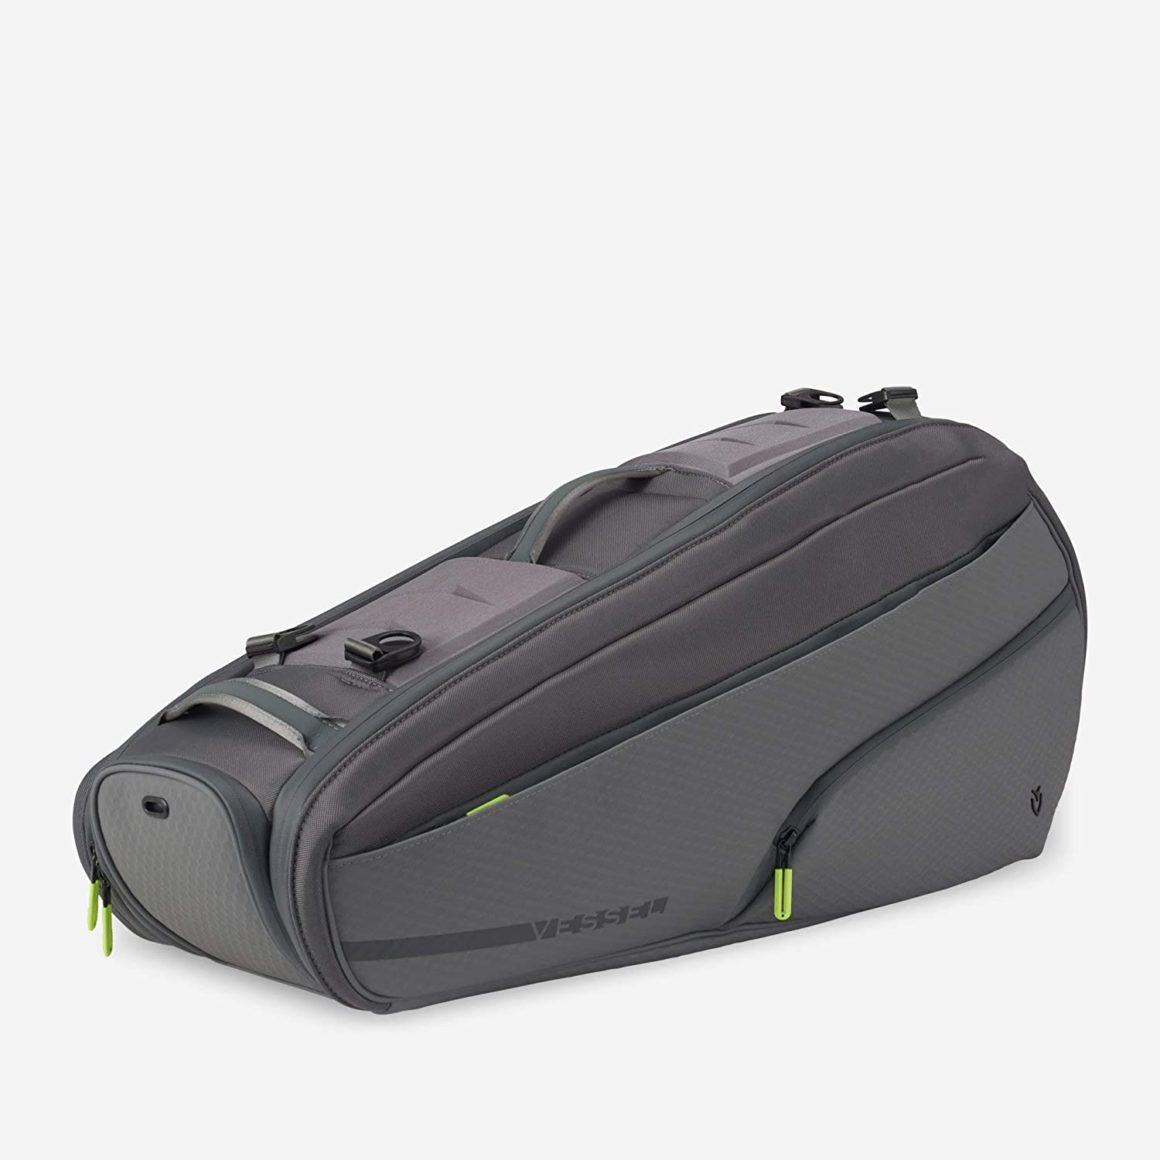 VESSEL Baseline Racquet Bag - Grey Tech